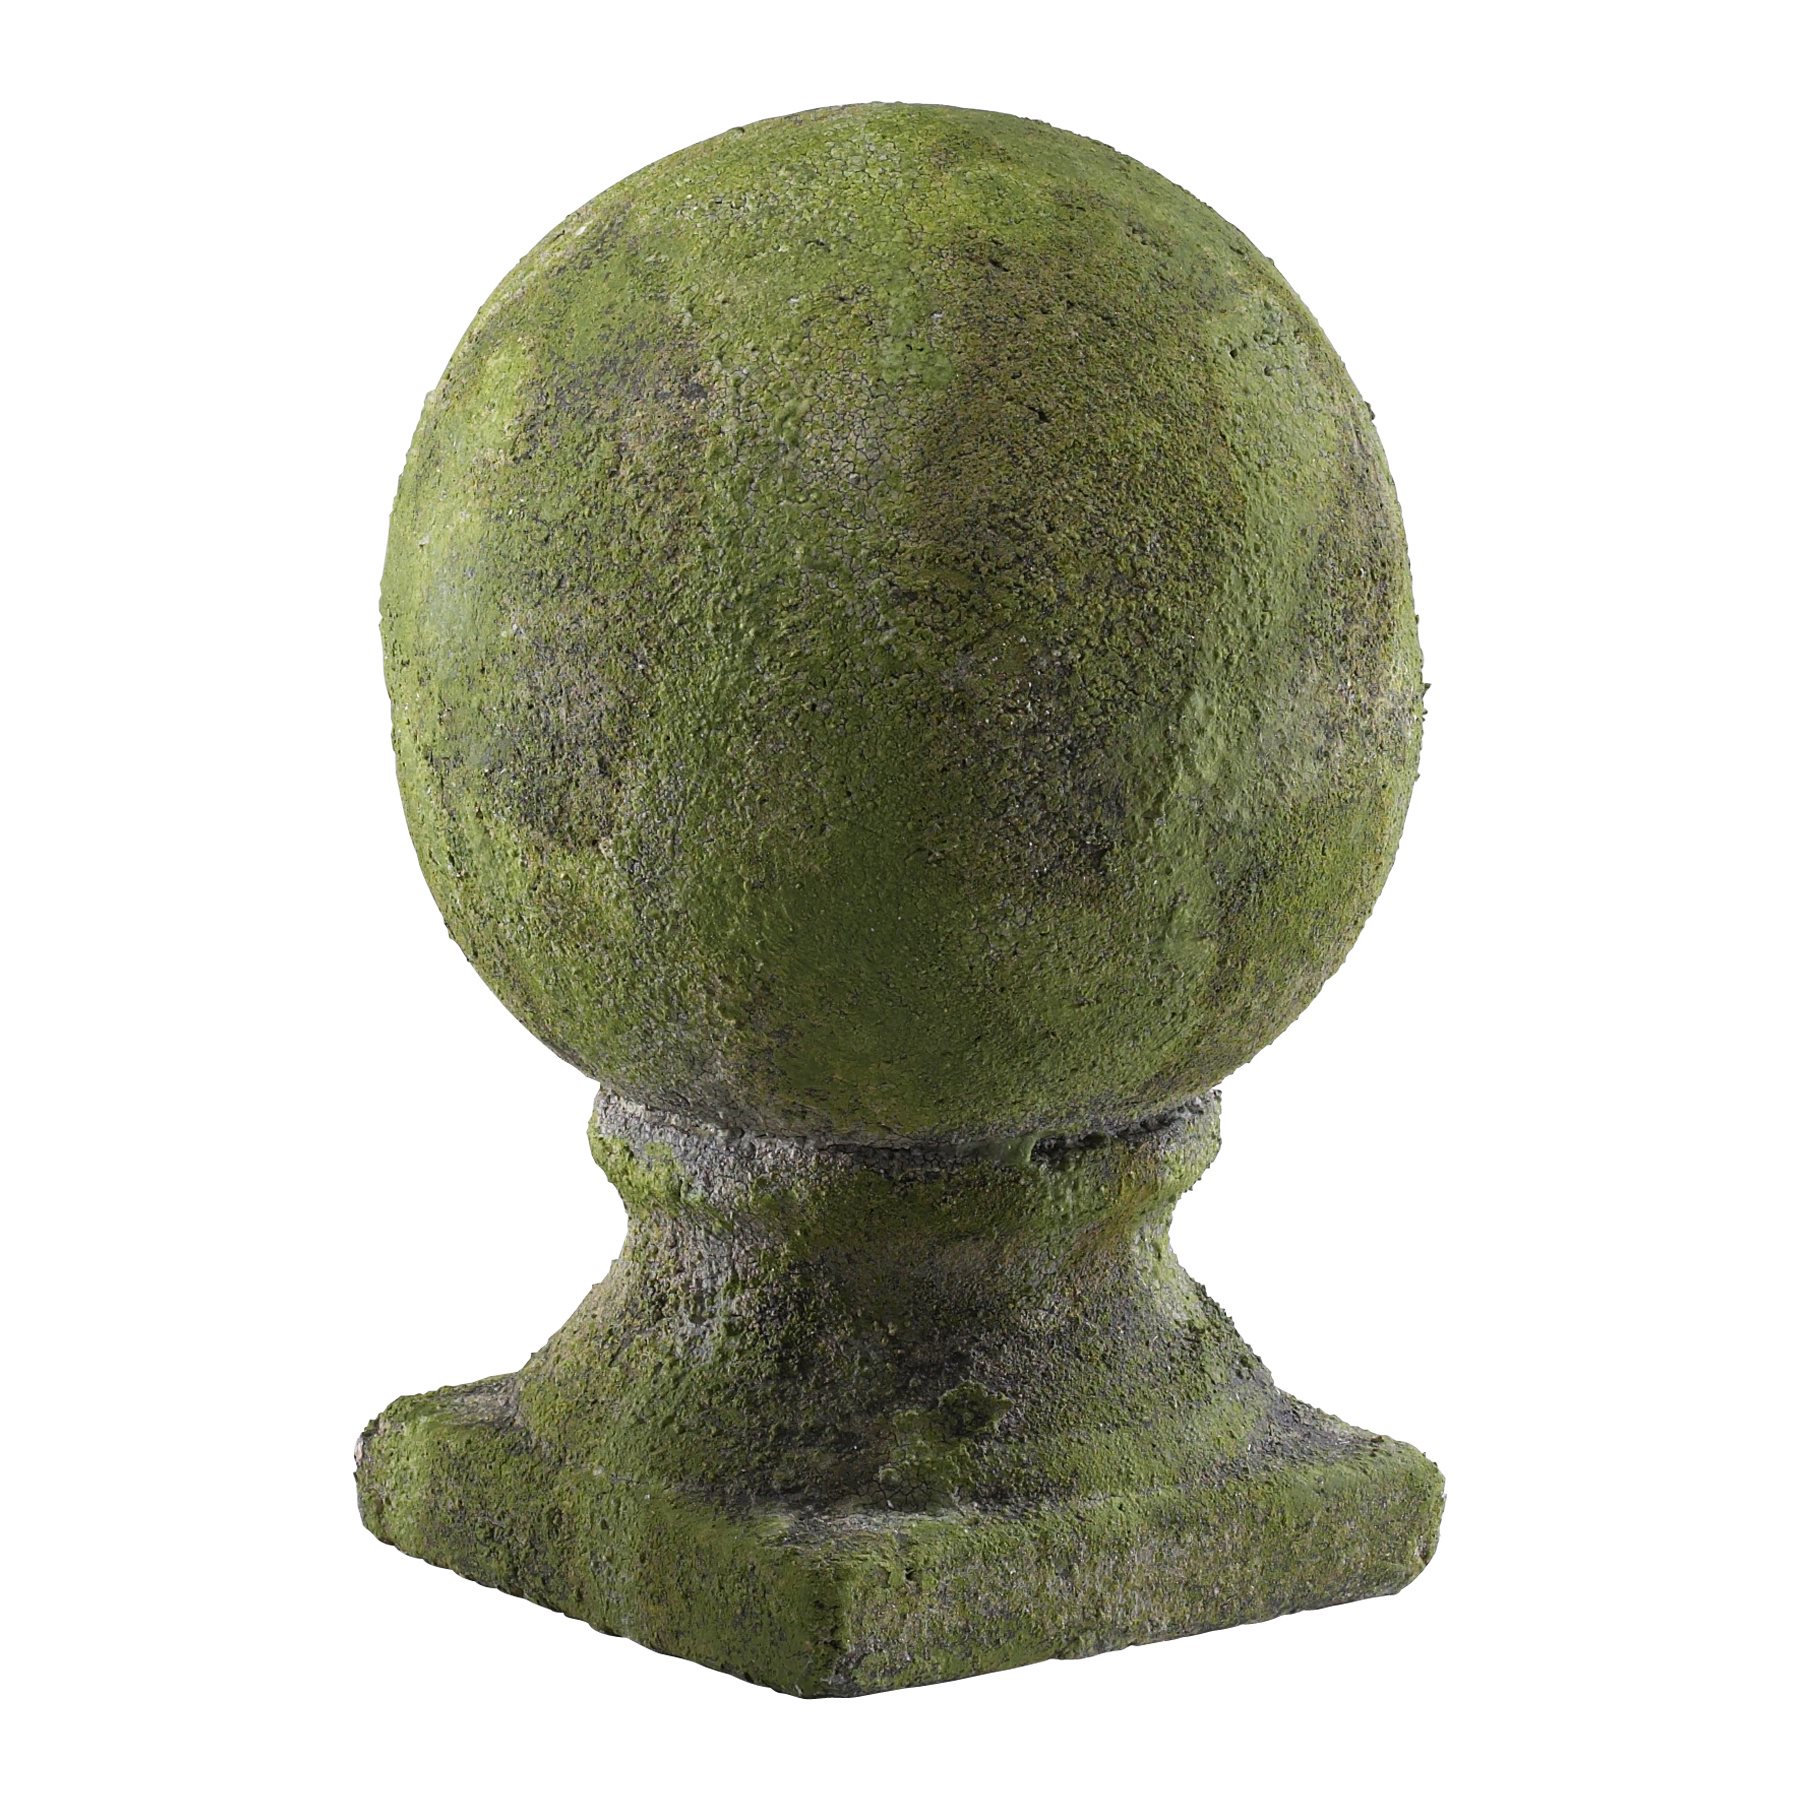 Cyan design 01031 sculptural small mossy garden sphere cn for Sphere garden design